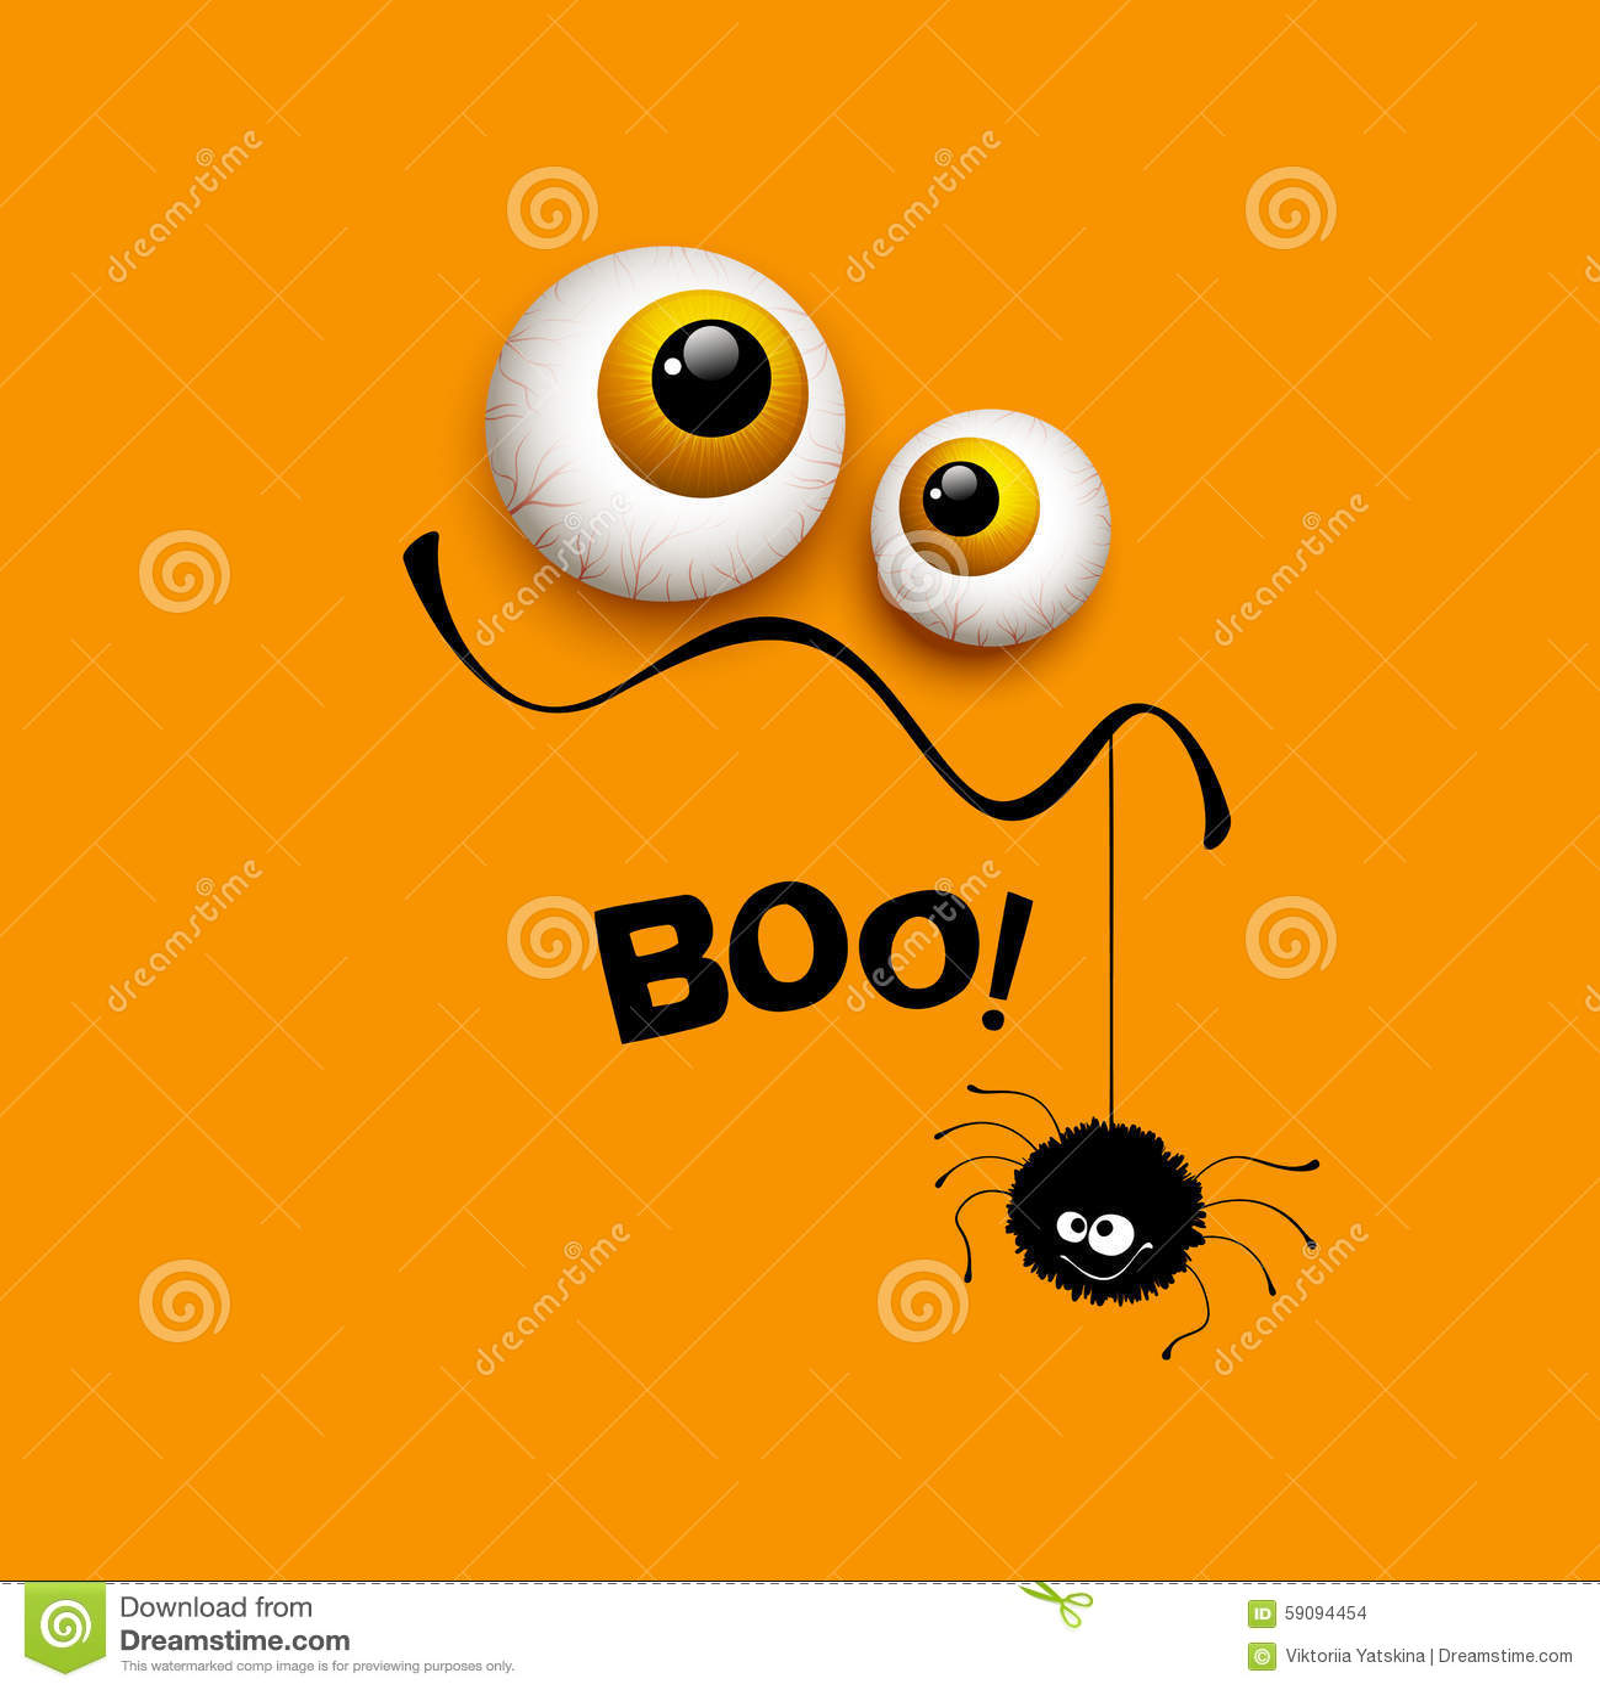 Funny Halloween Greeting Card Monster Eyes. Vector Stock Vector ...